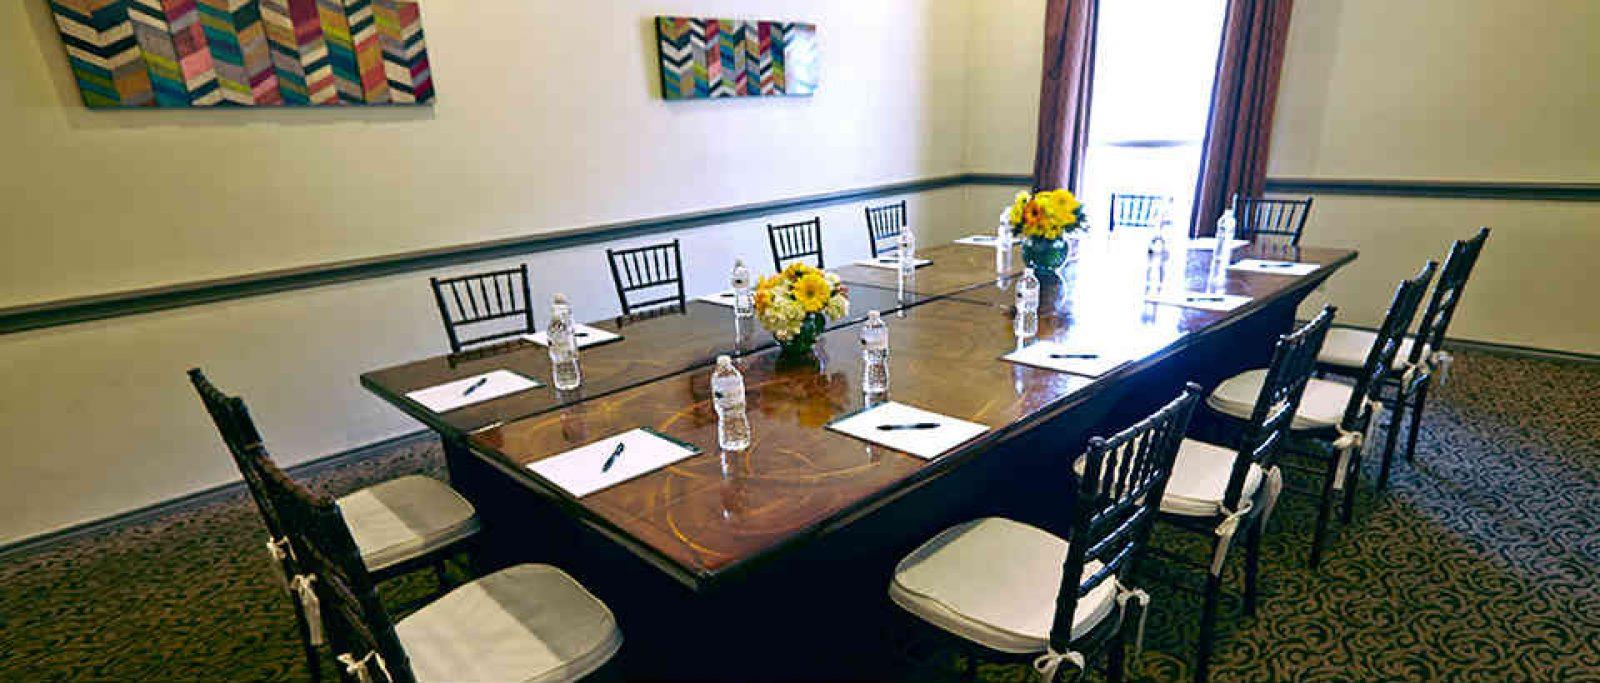 Canyon-Creek-Country-Club-Richardson-TX-meeting-room-960x410_rotatingGalleryFront